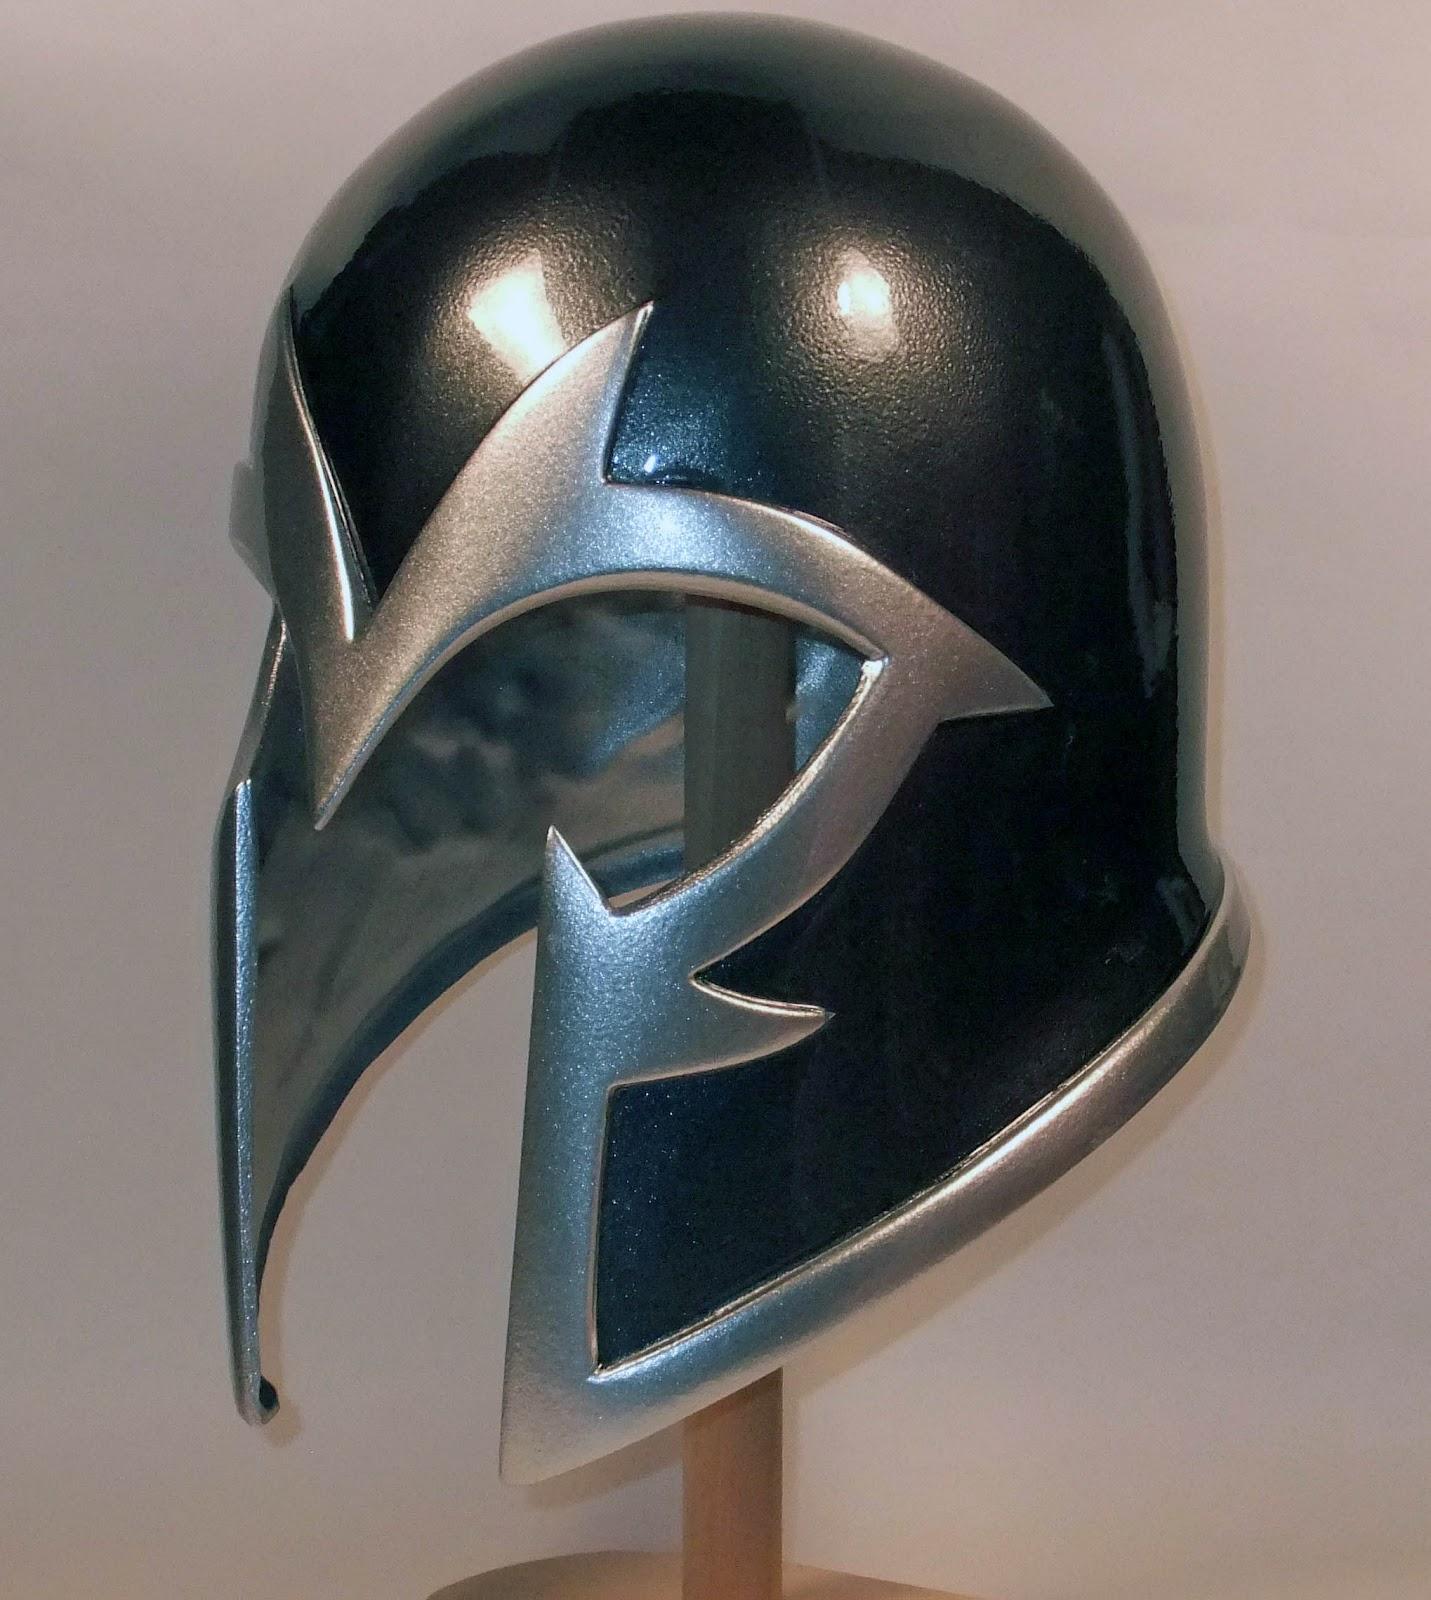 Formosa-Collection: magneto helmet